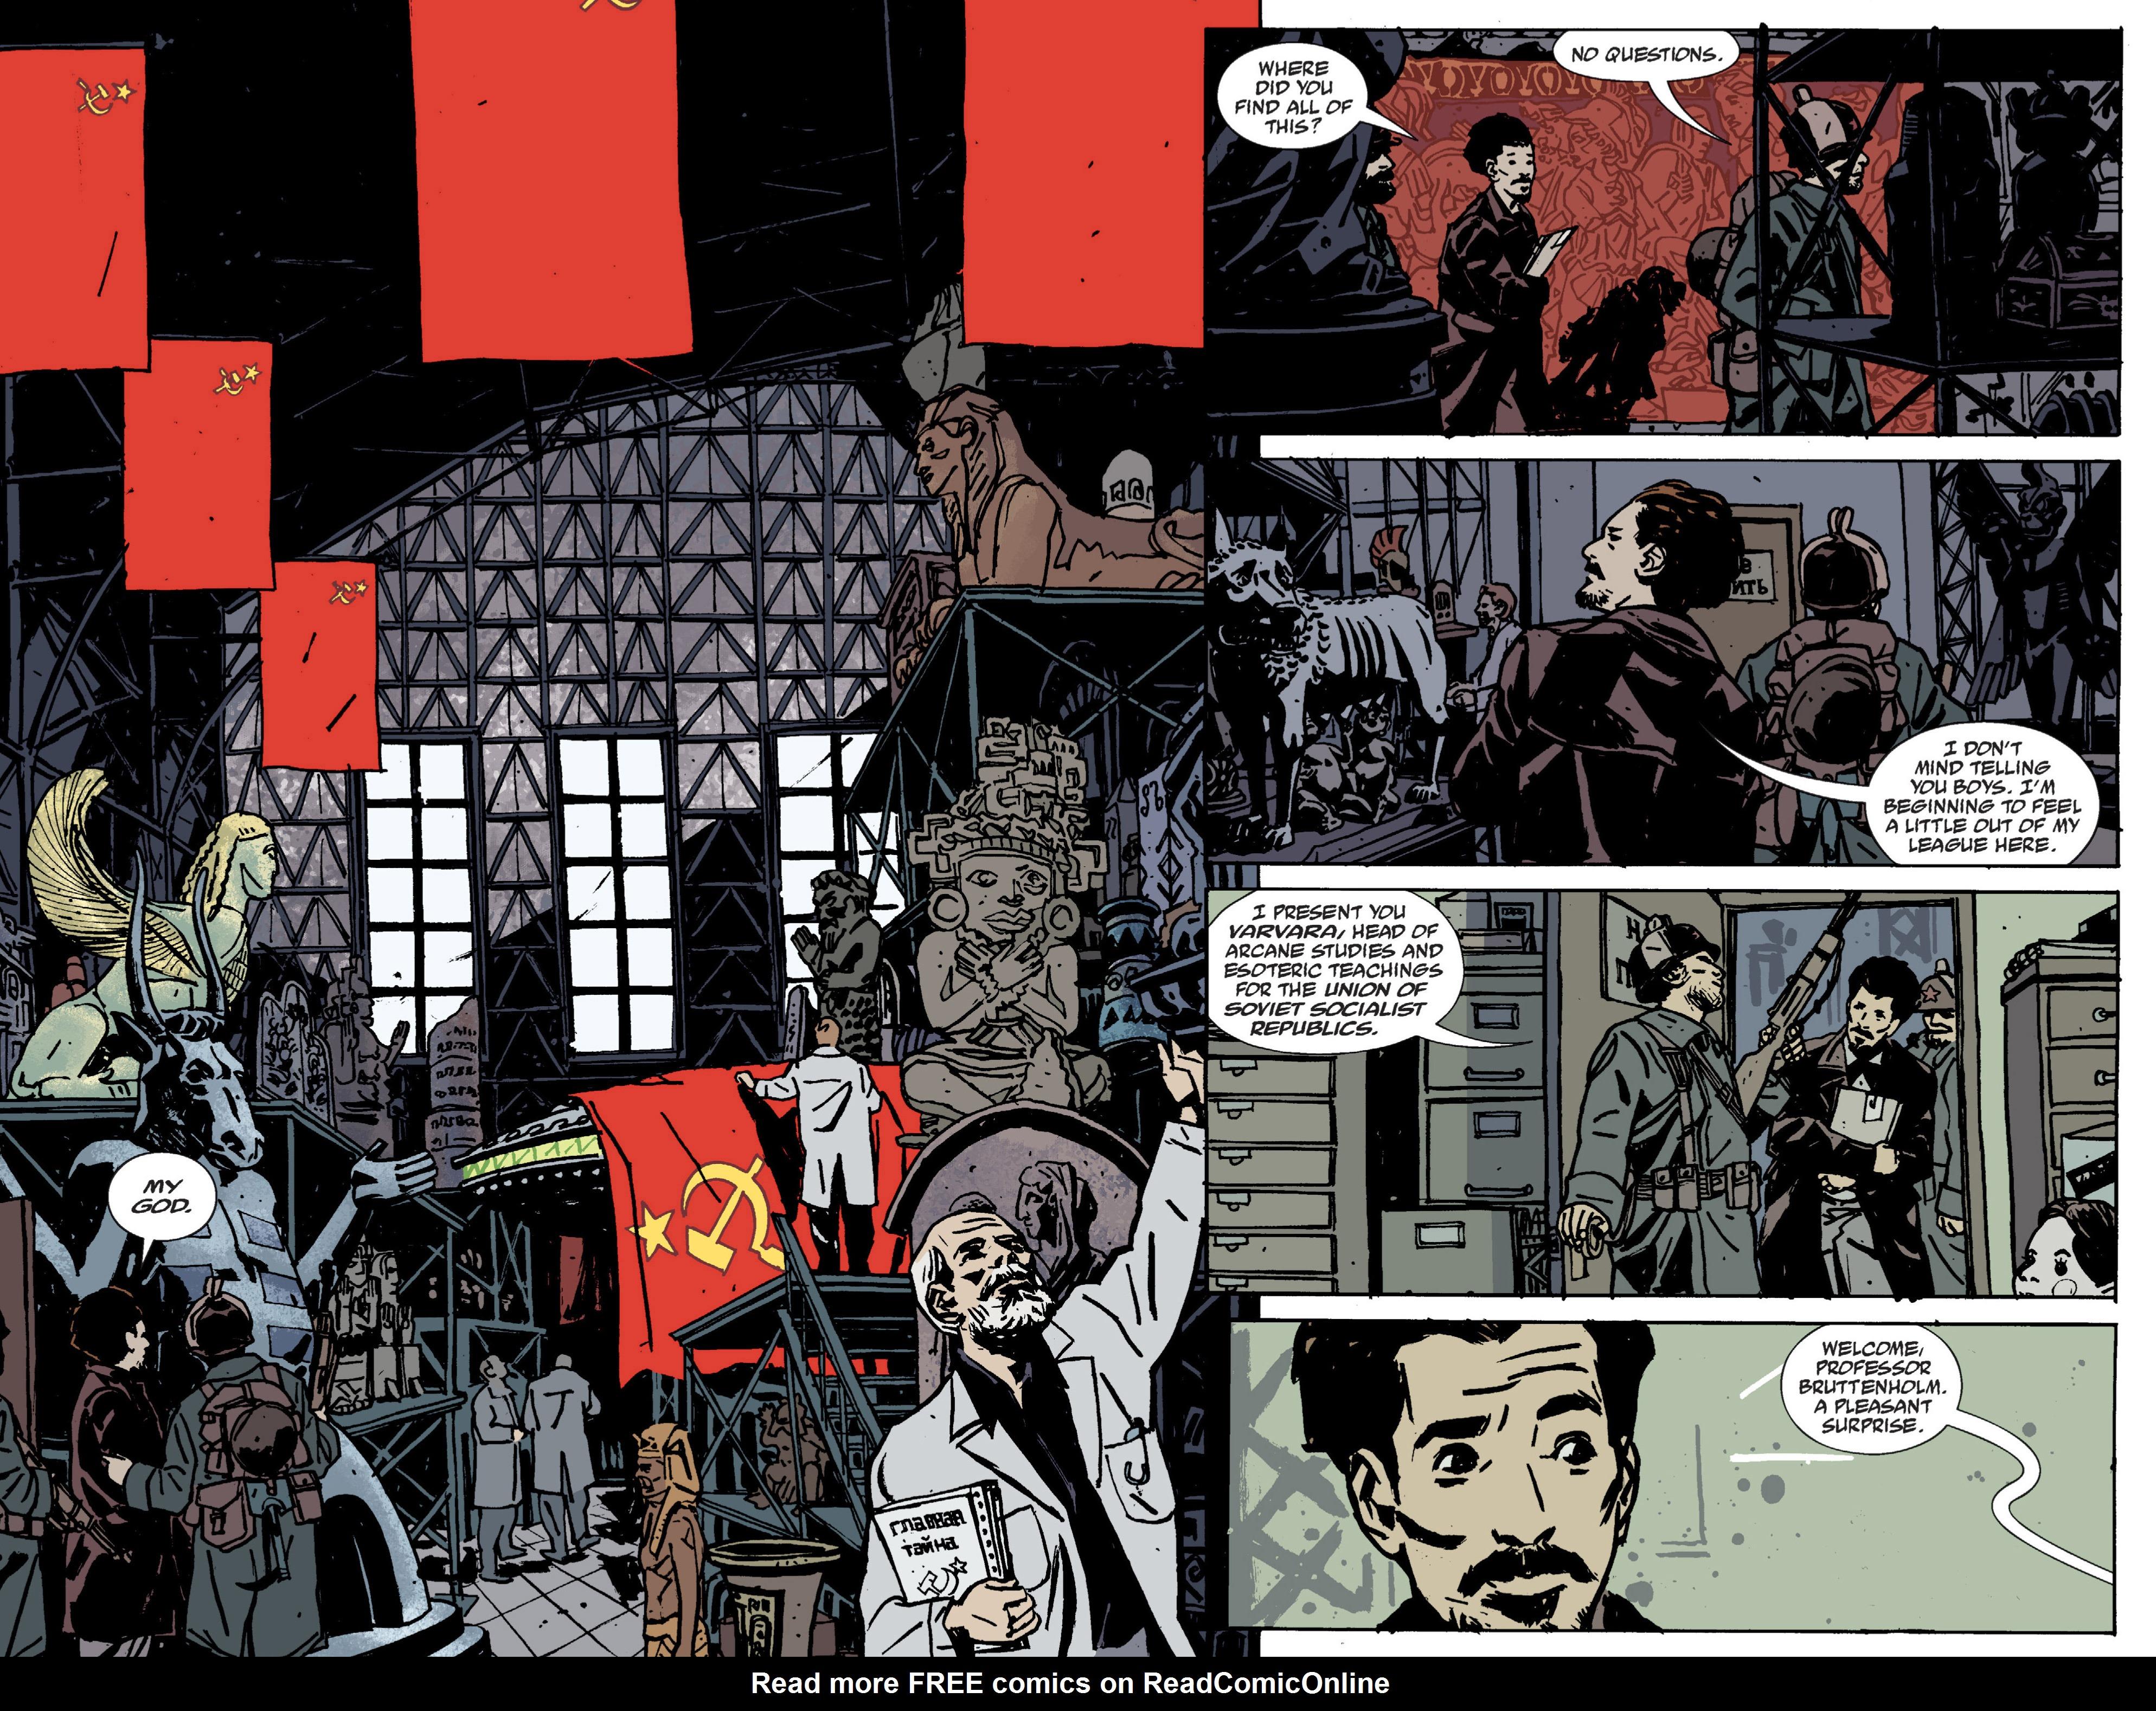 Read online B.P.R.D. (2003) comic -  Issue # TPB 9 - 22